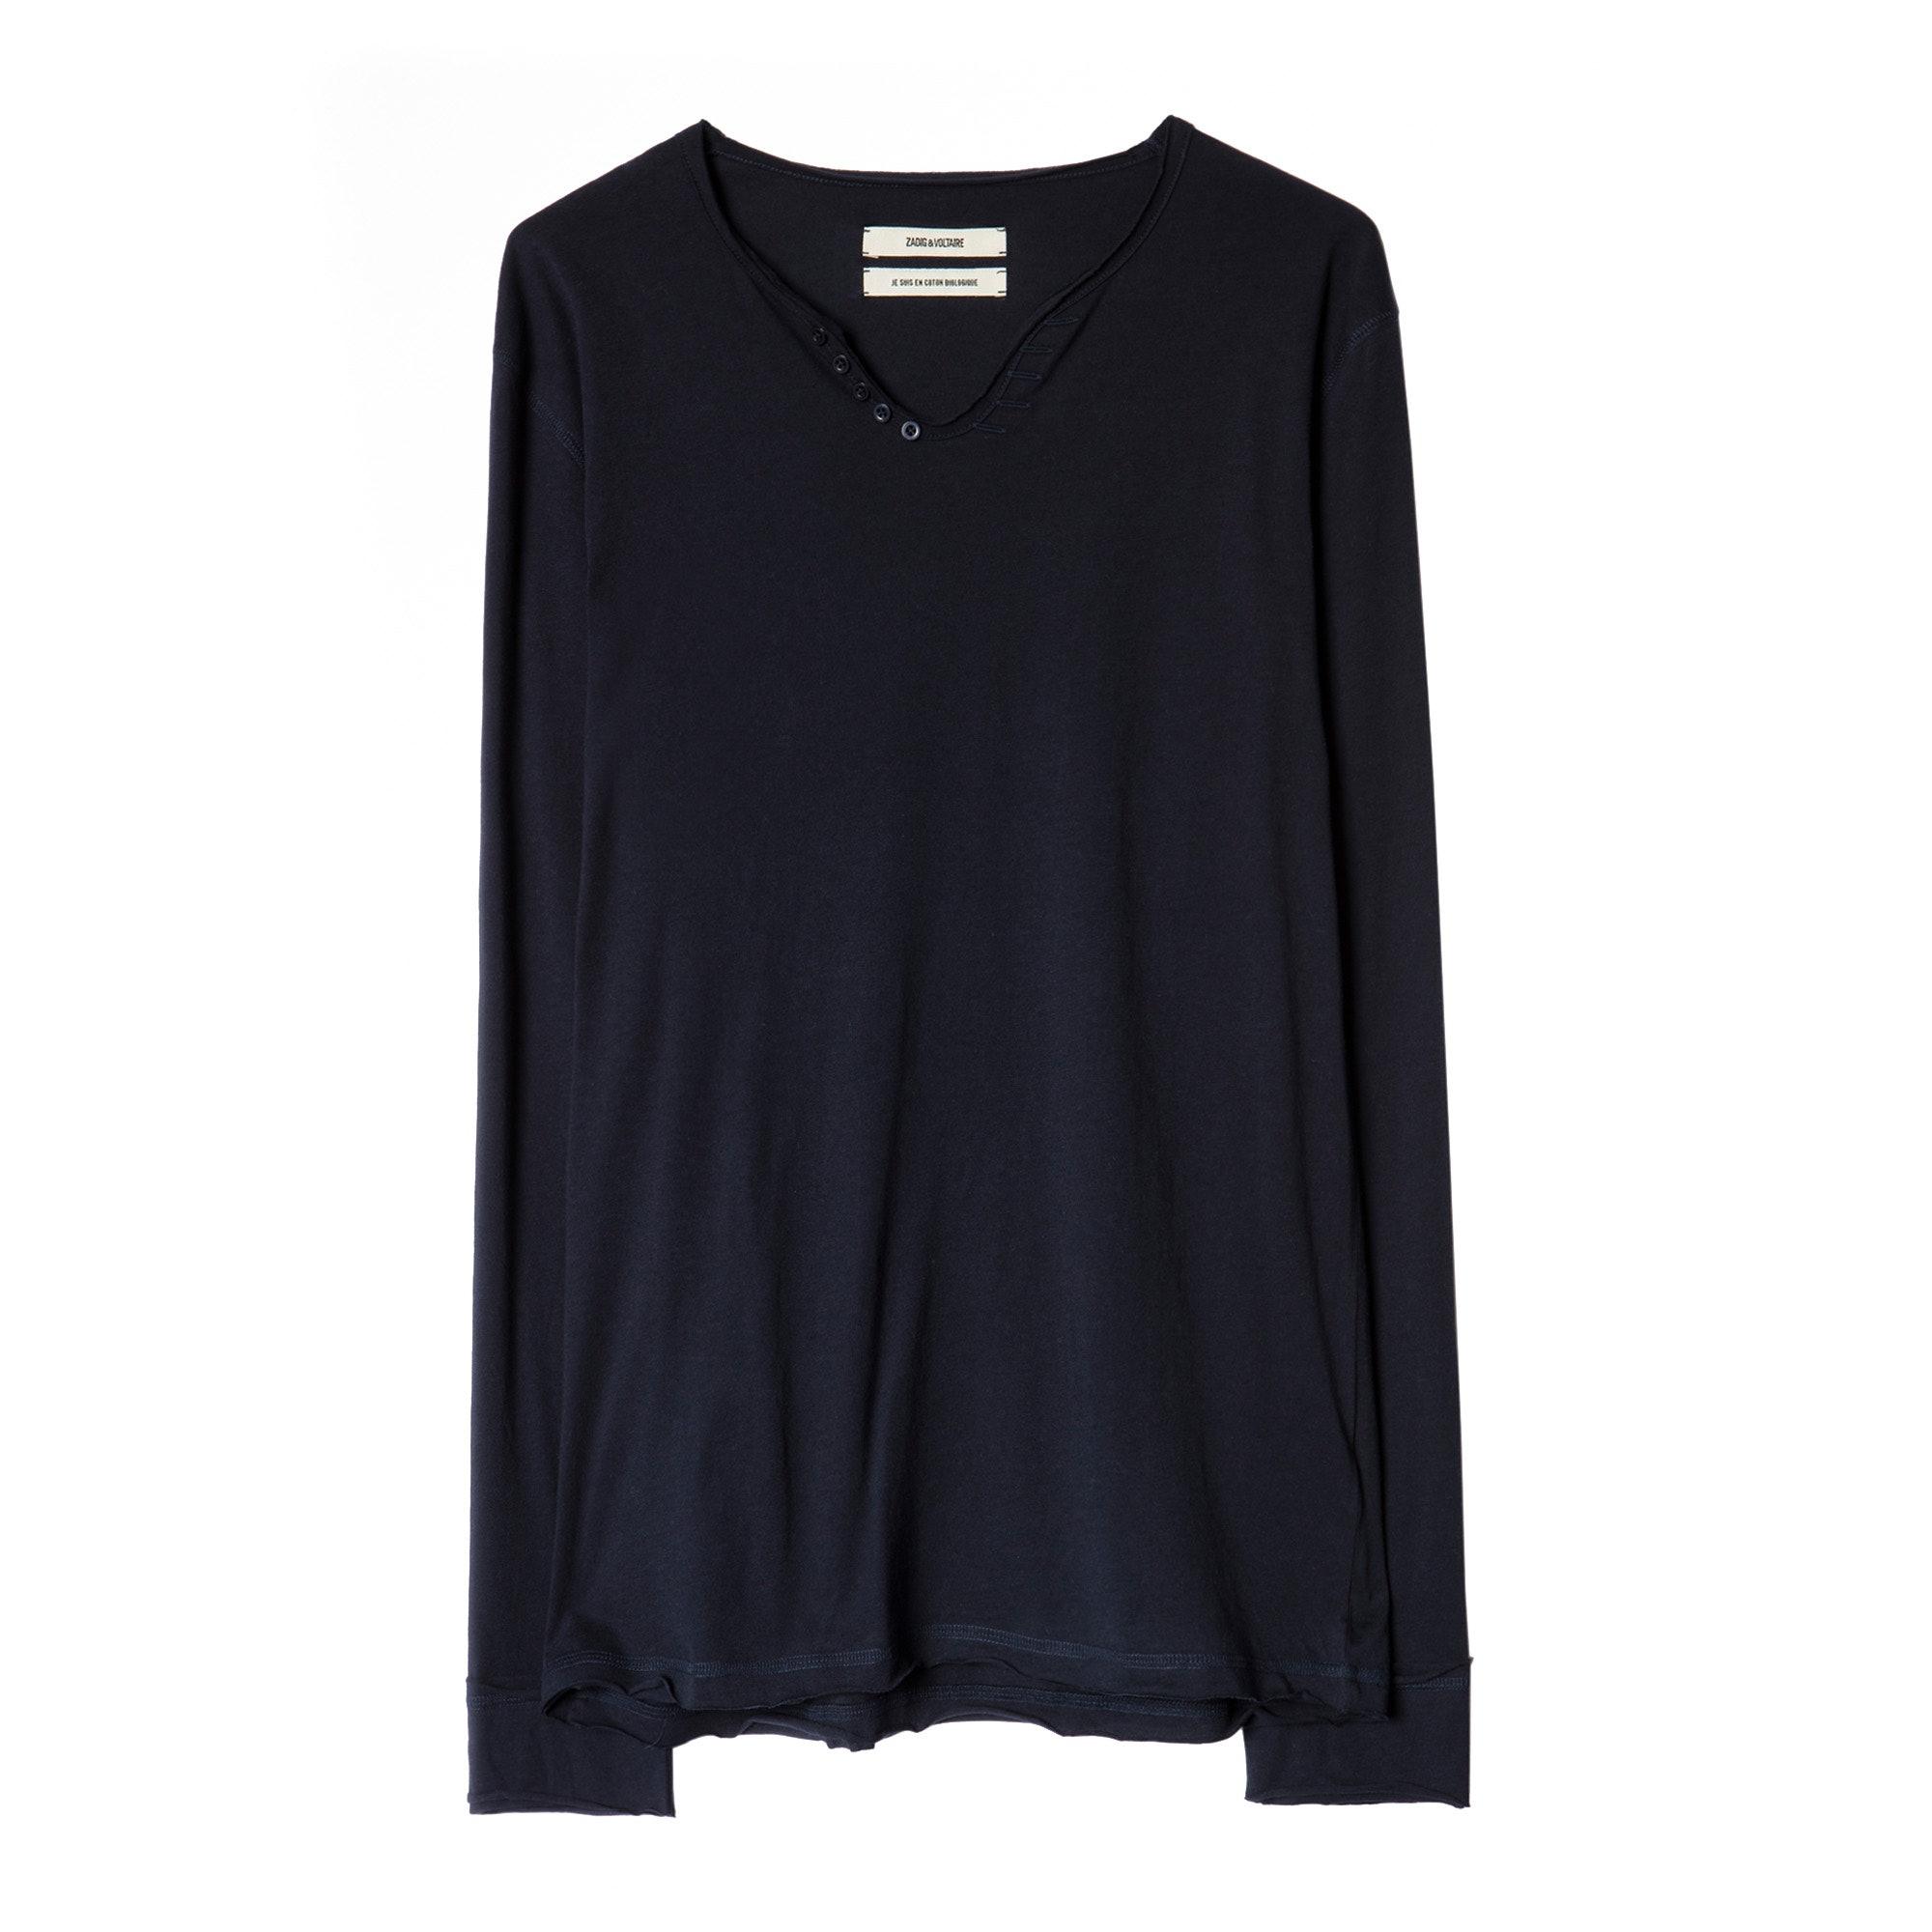 T-shirt Monastir - Taille XS  - Zadig & Voltaire - Modalova